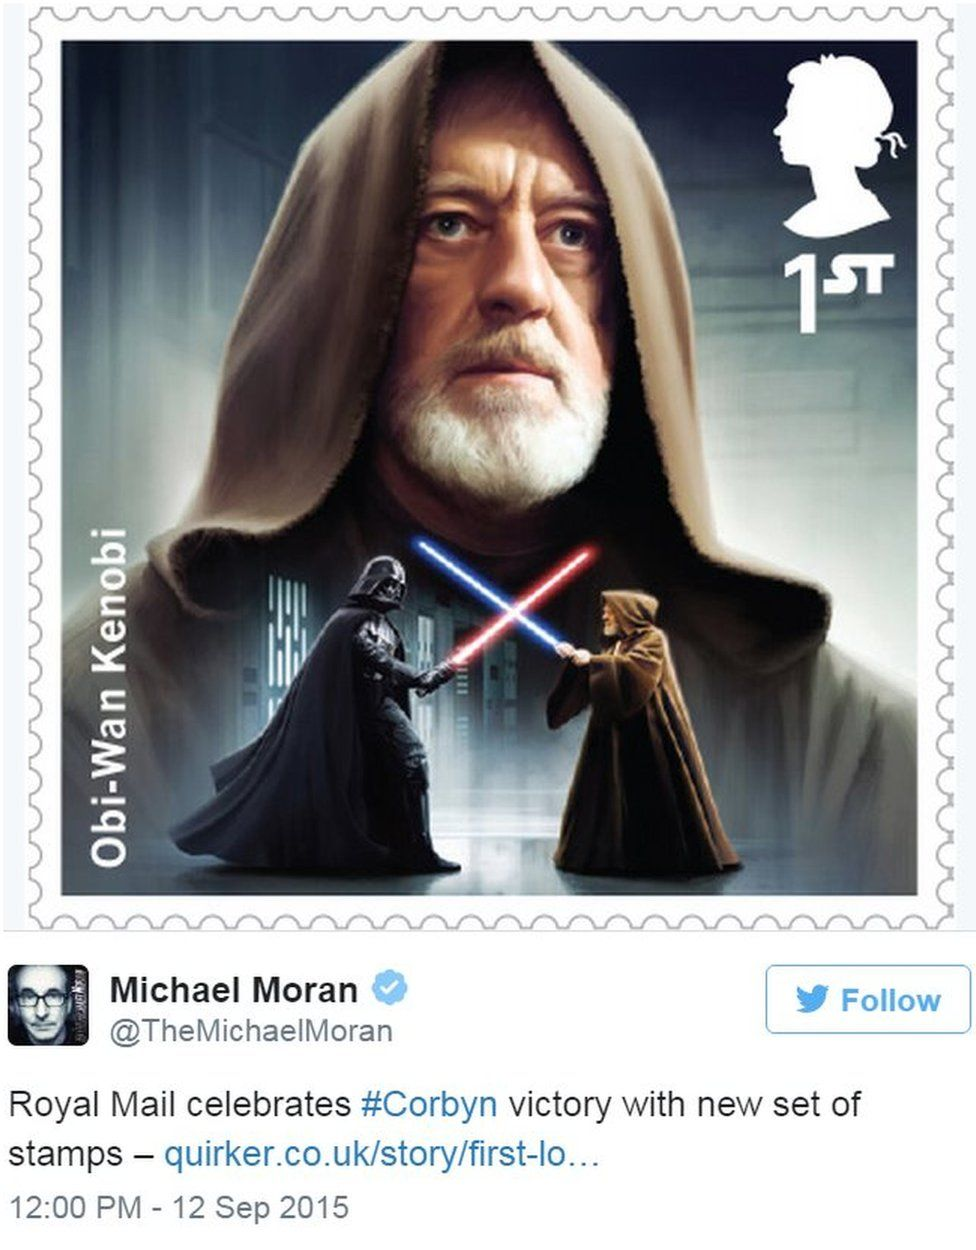 Tweet by Michael Moran showing Jeremy Corbyn Star Wars stamp - 12 September 2015